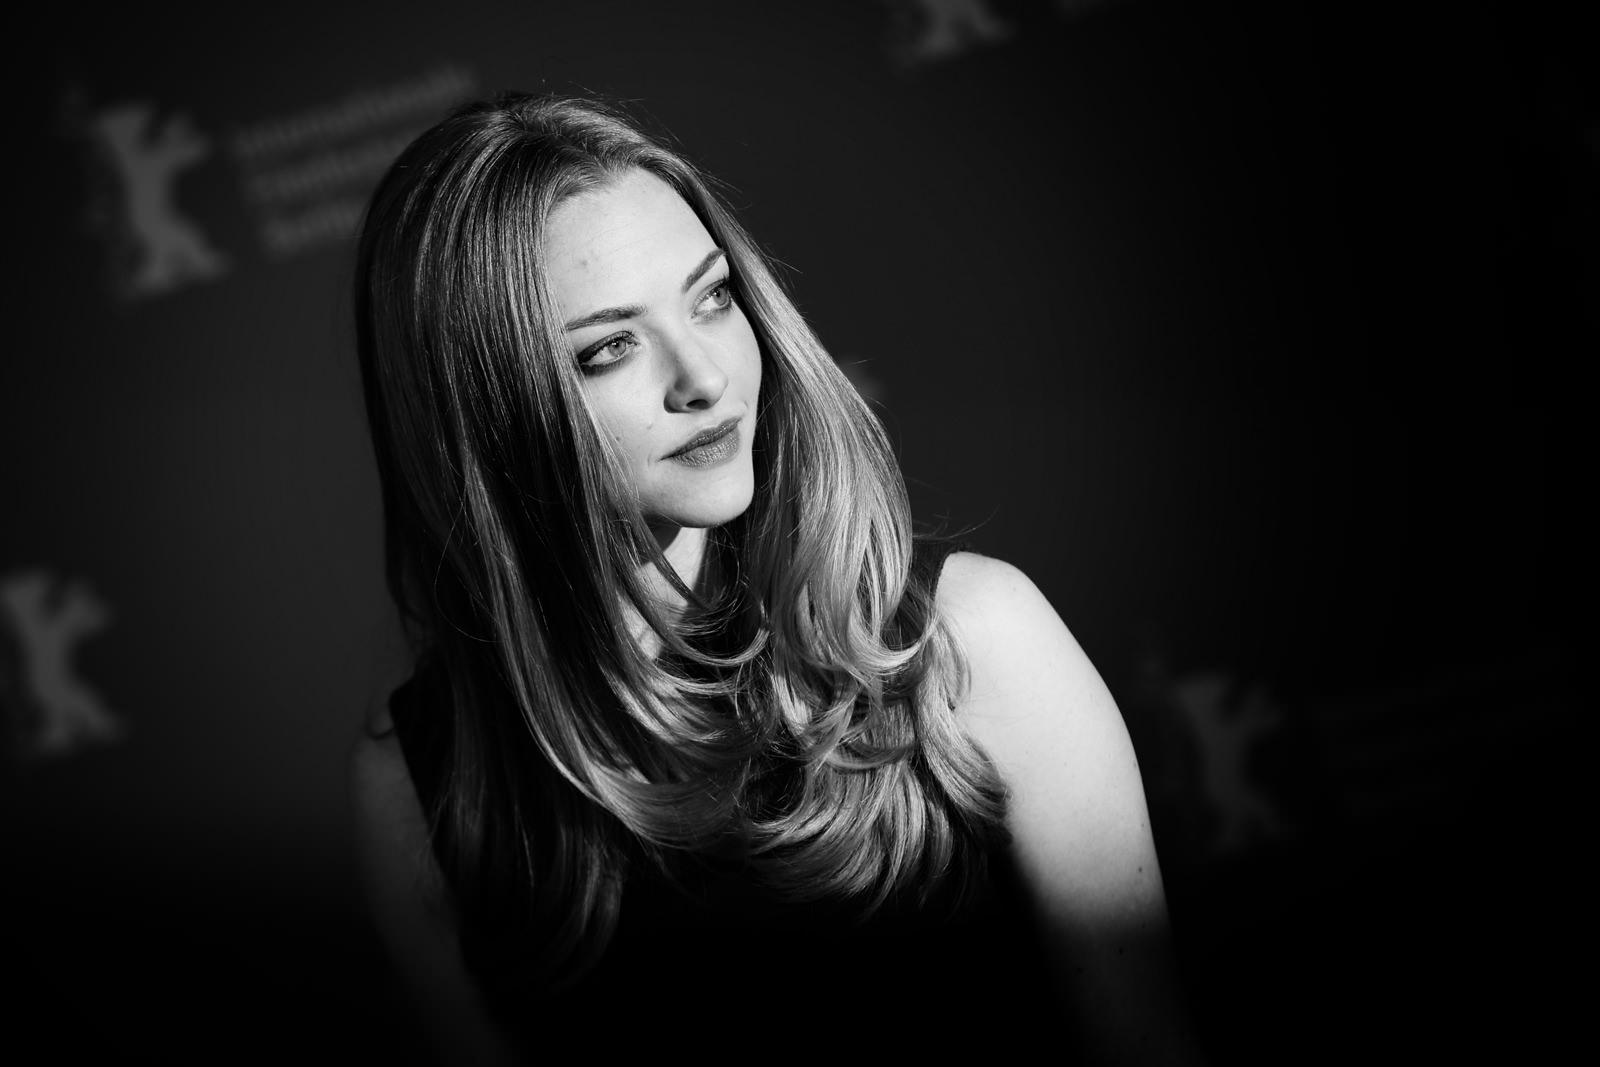 Amanda Seyfried Photo Gallery